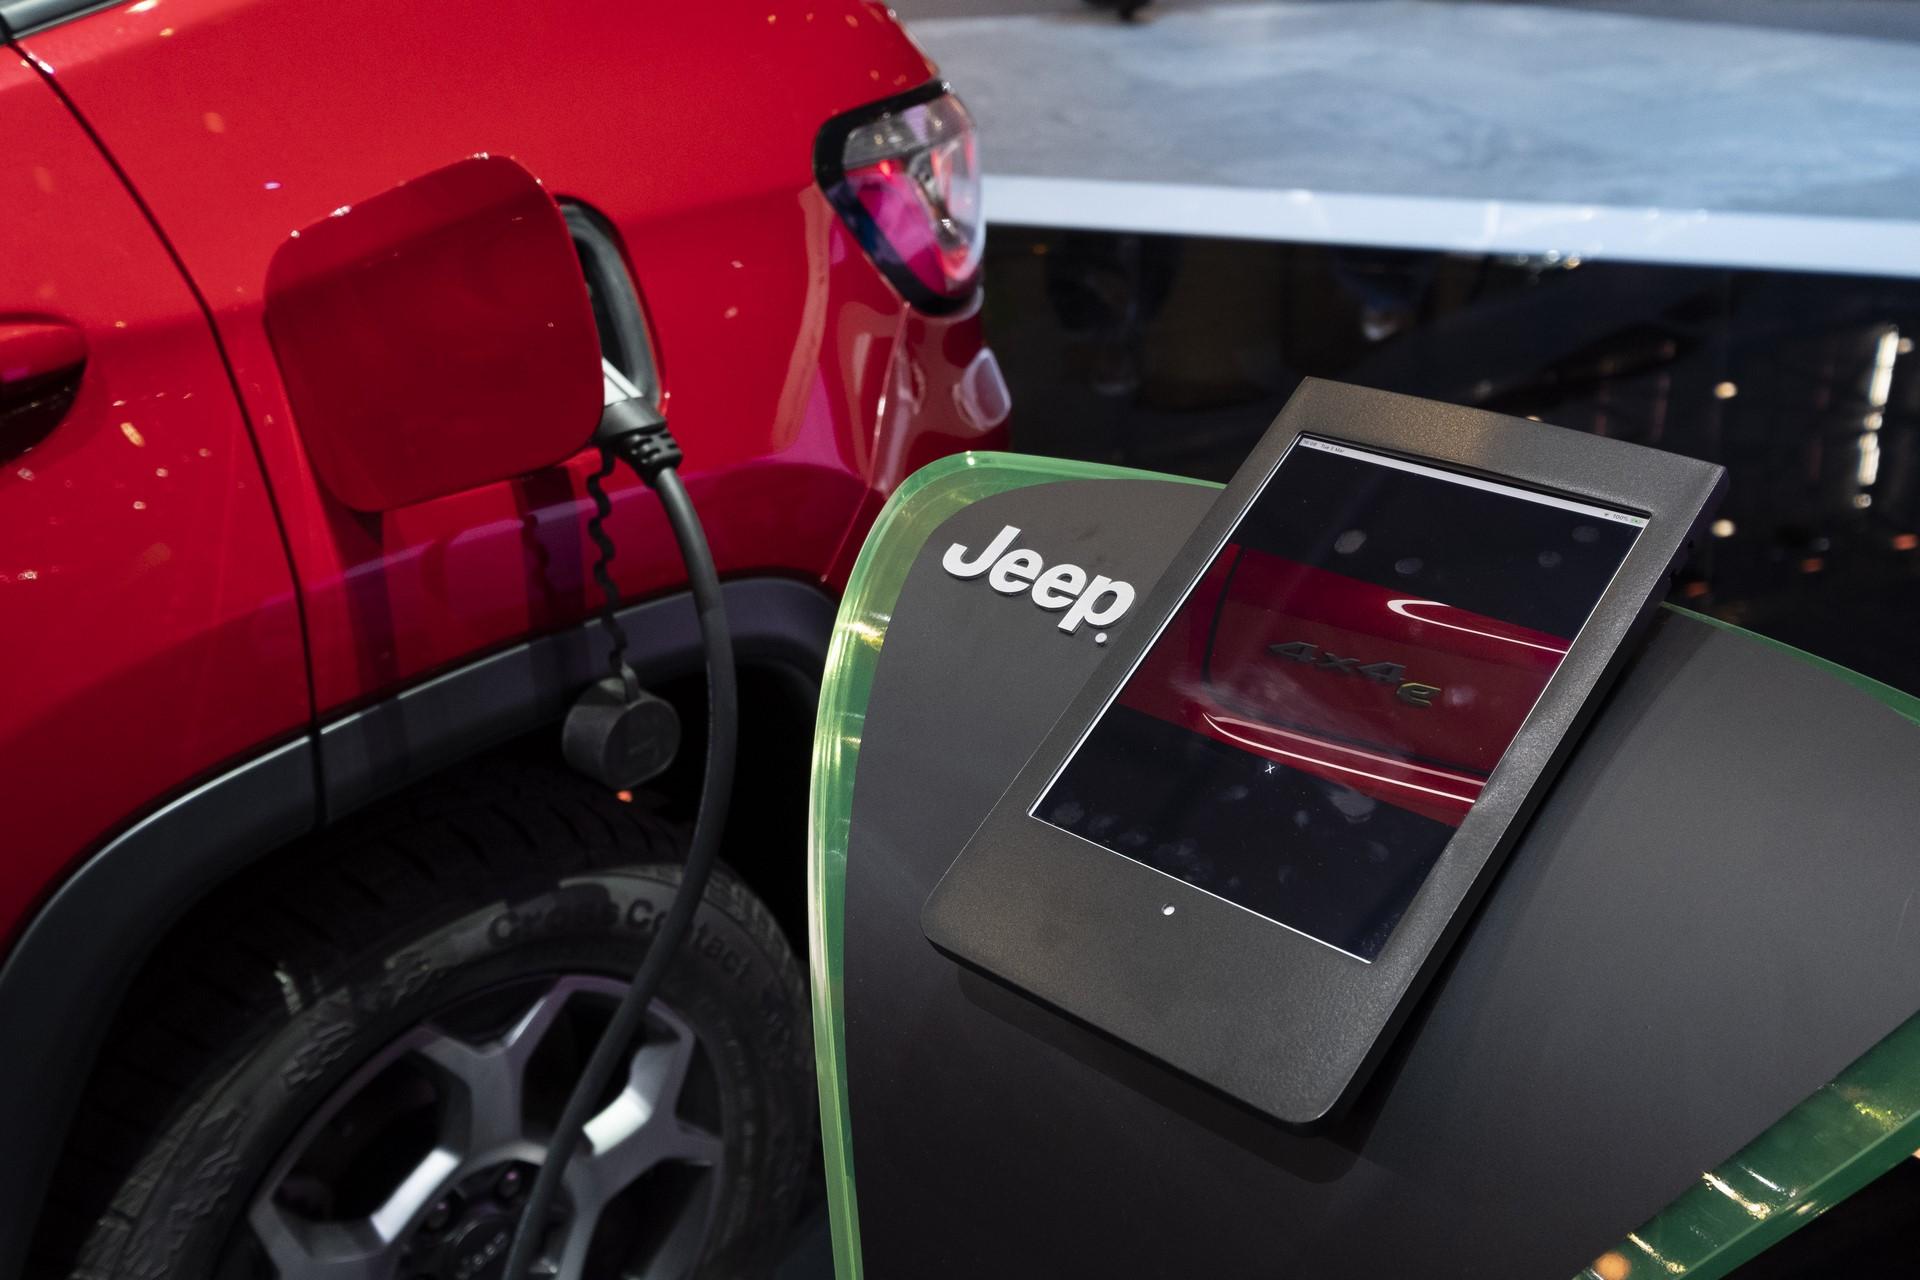 jeep geneva 2019 (5)